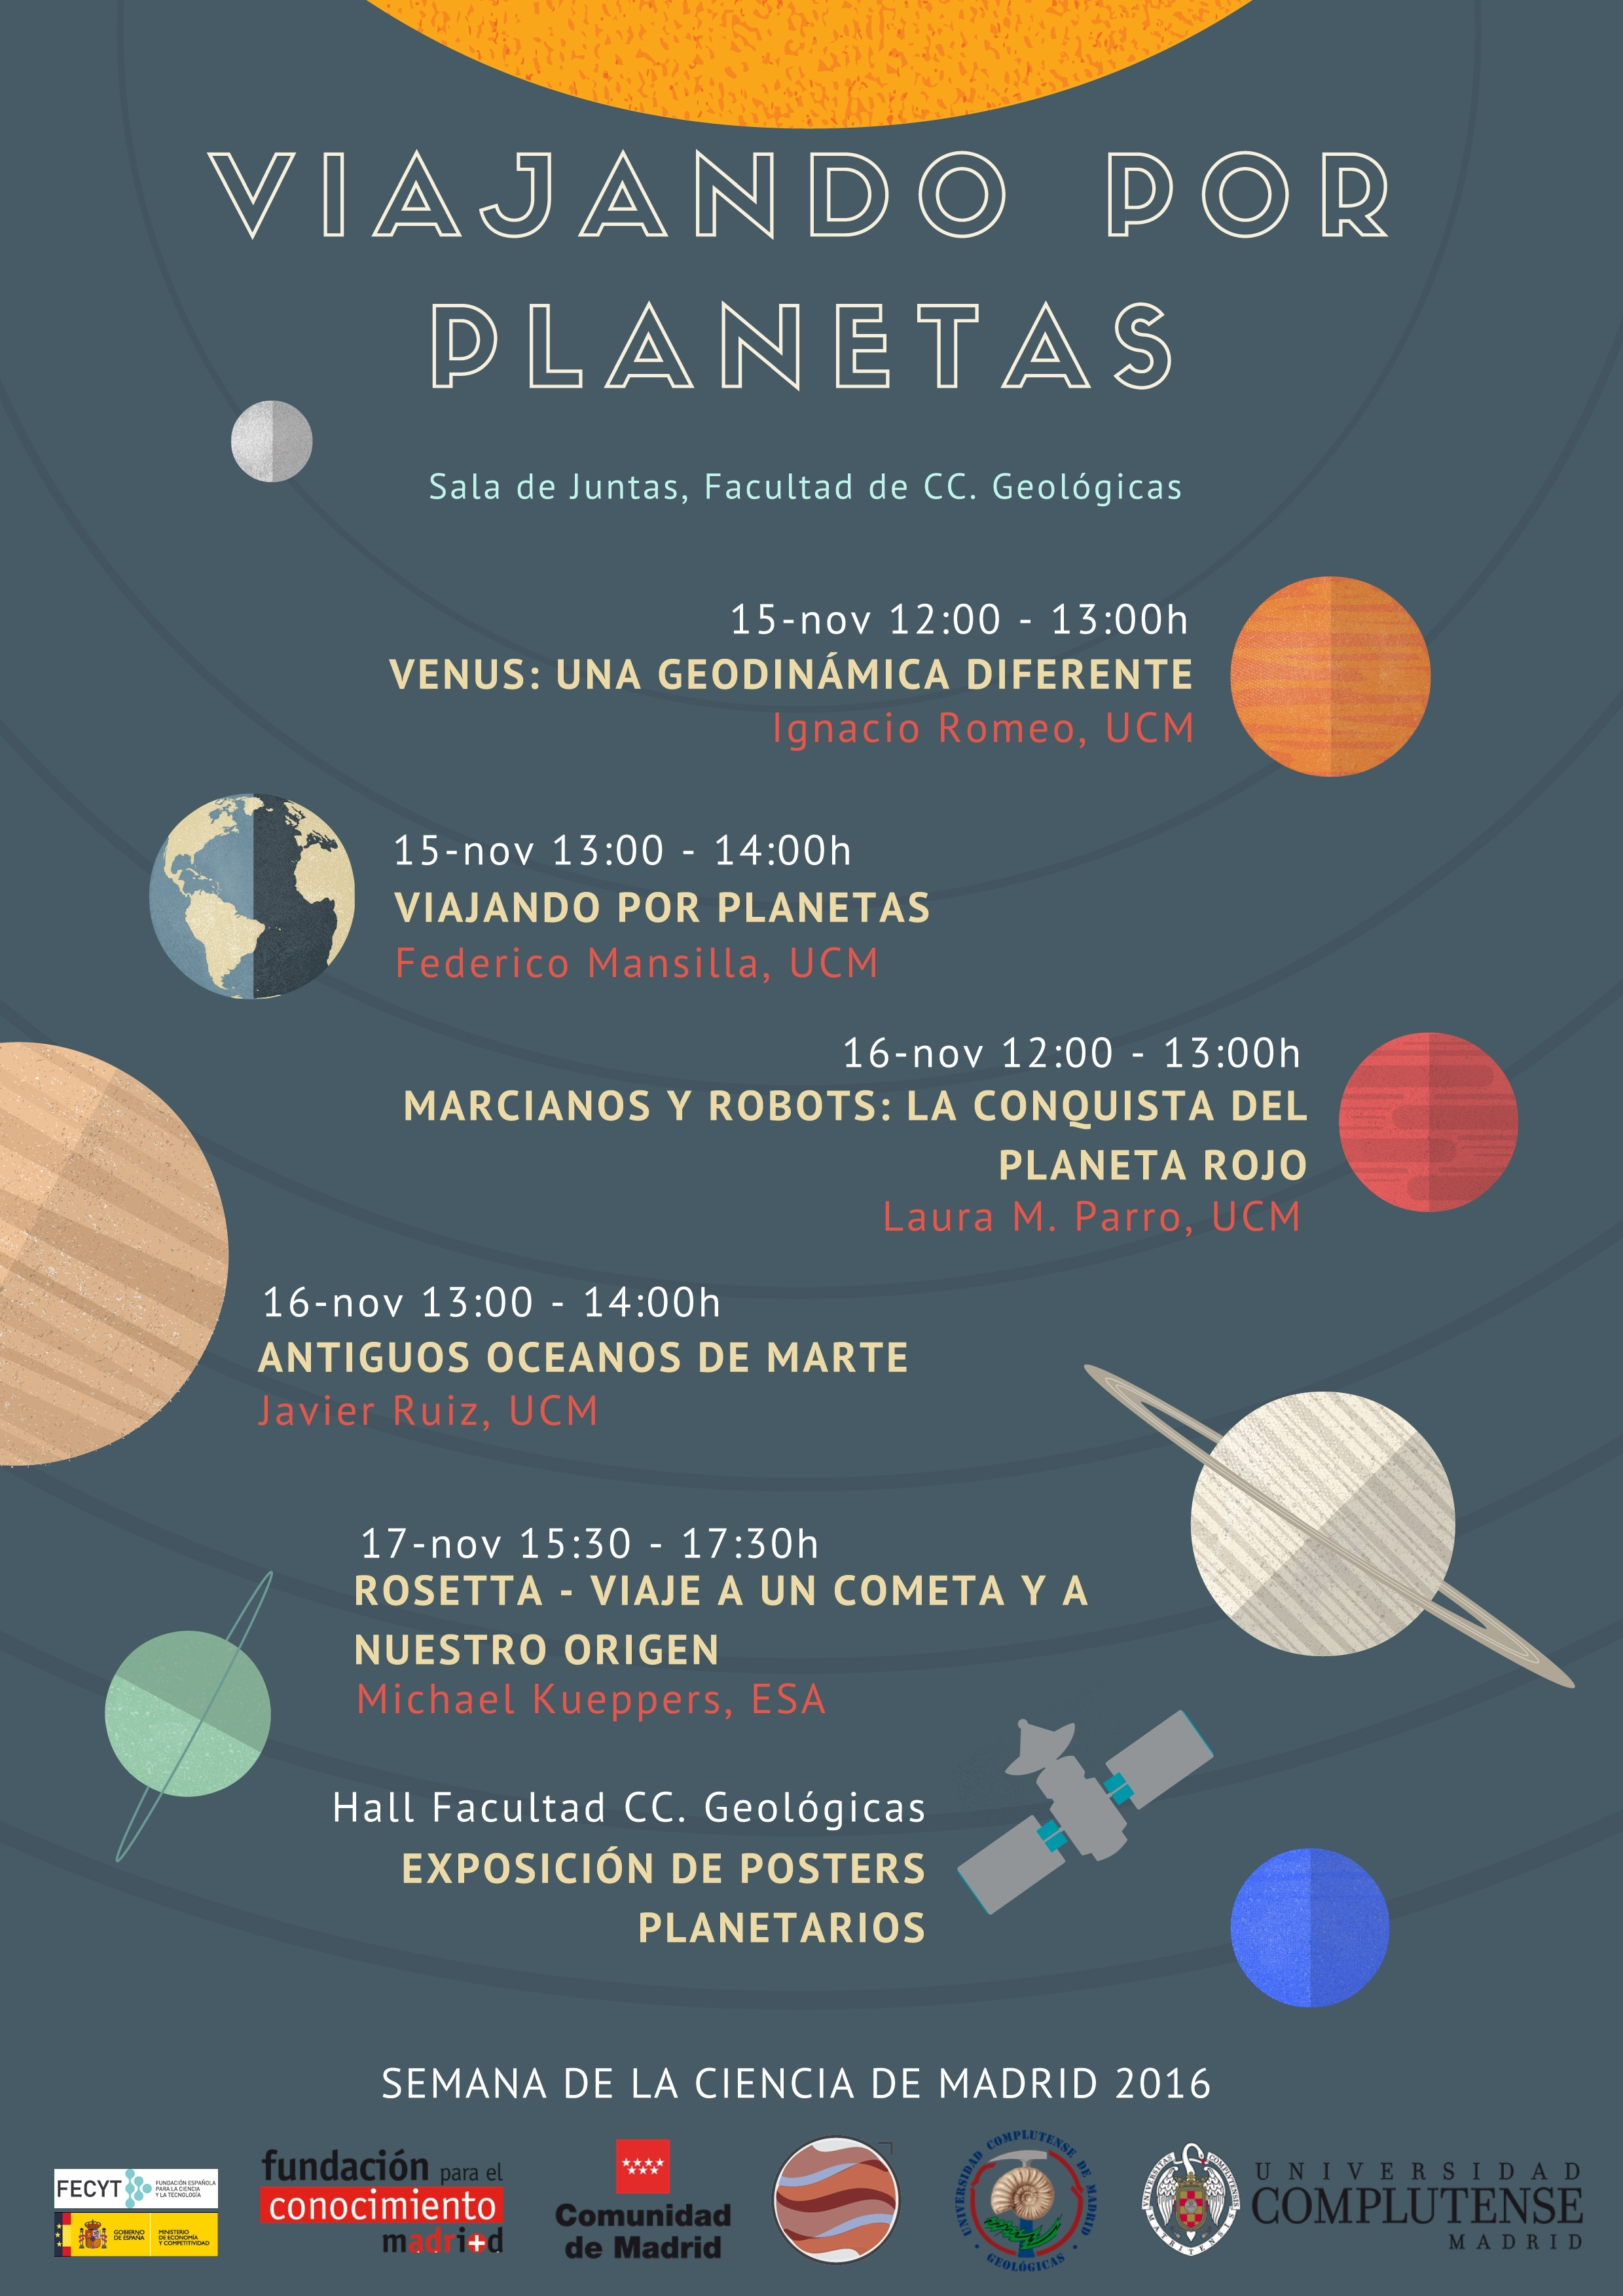 viajando por planetas